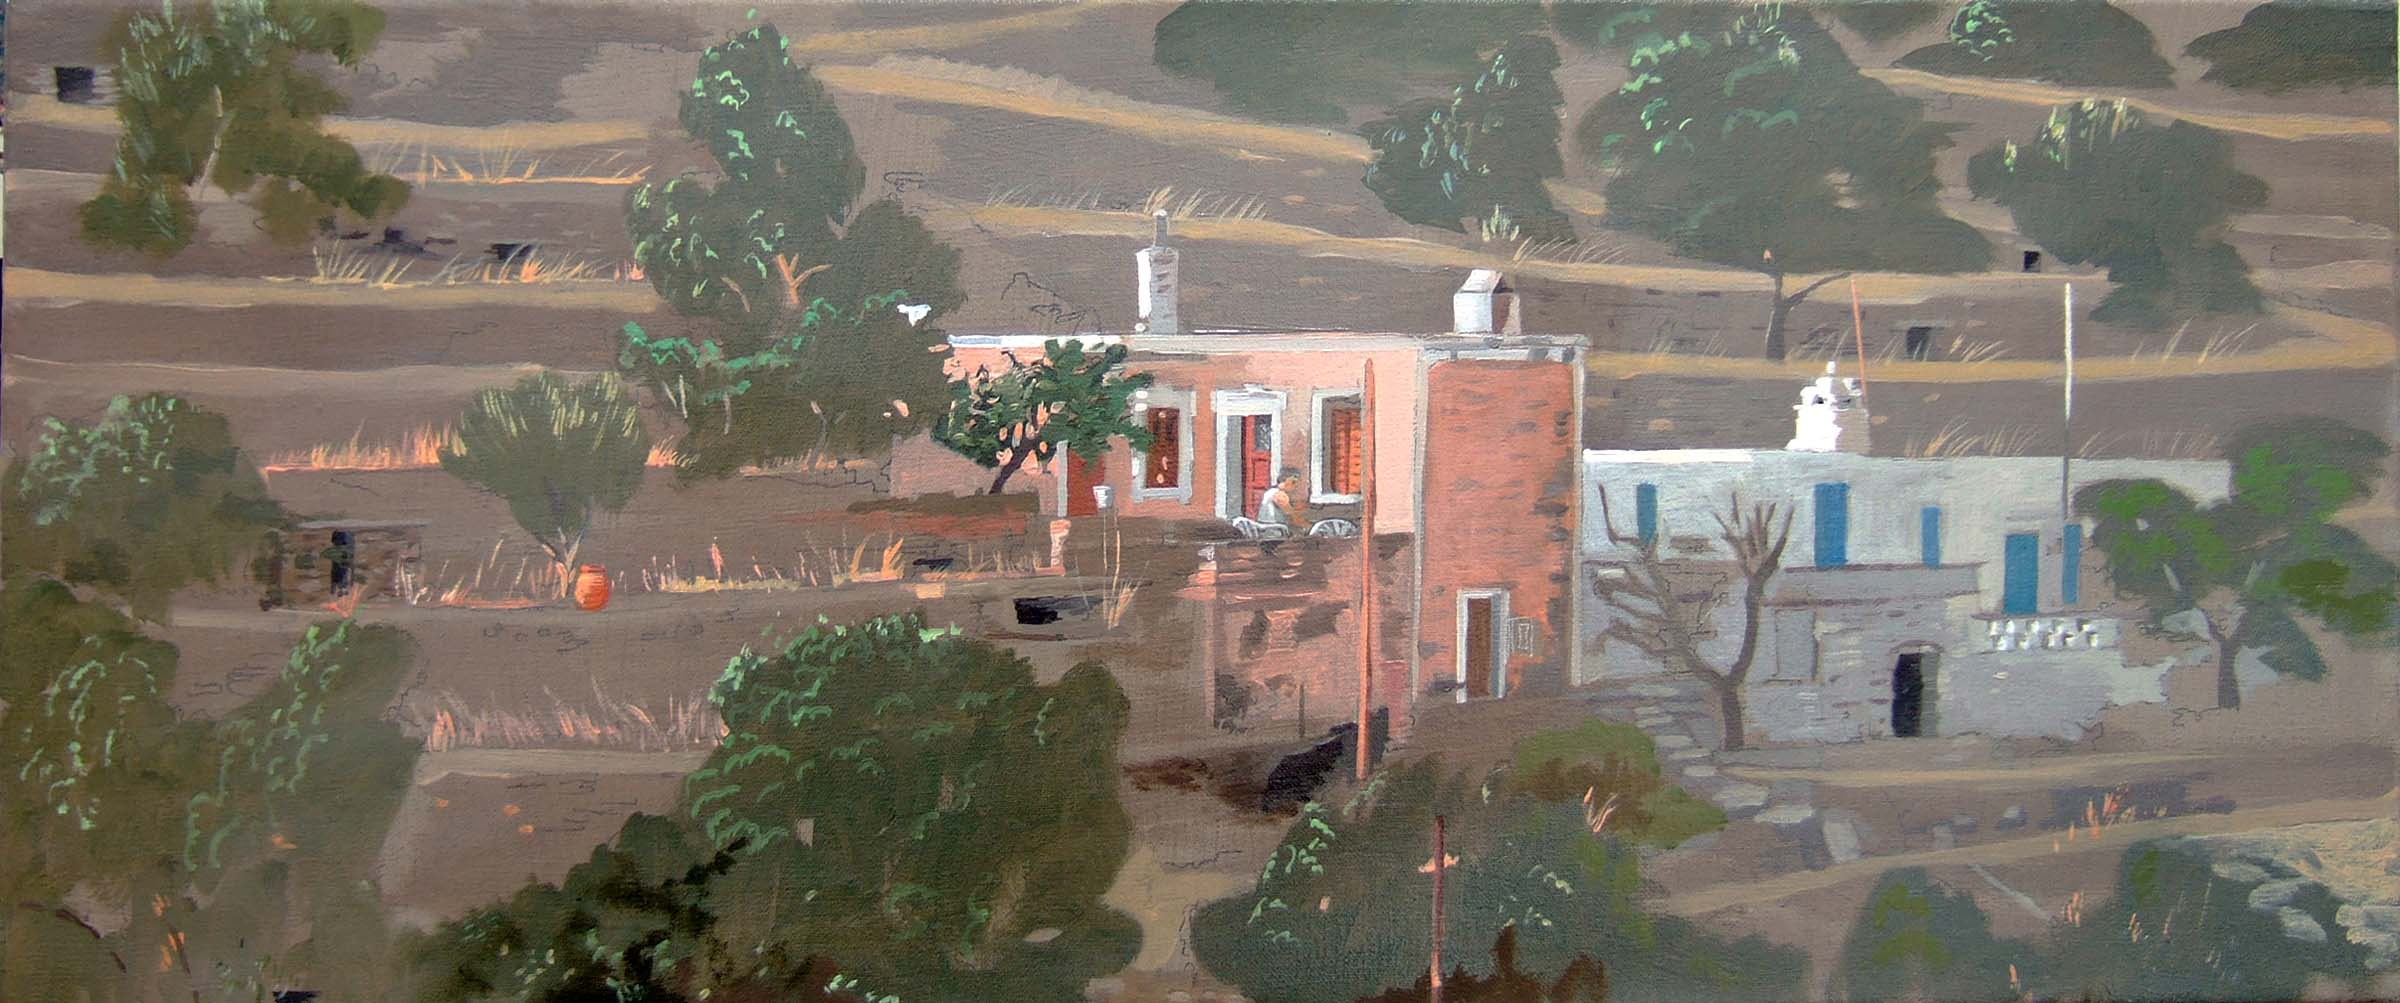 site-Pink House- Zaganiari 25 x 60 cm.10x24 in.jpg